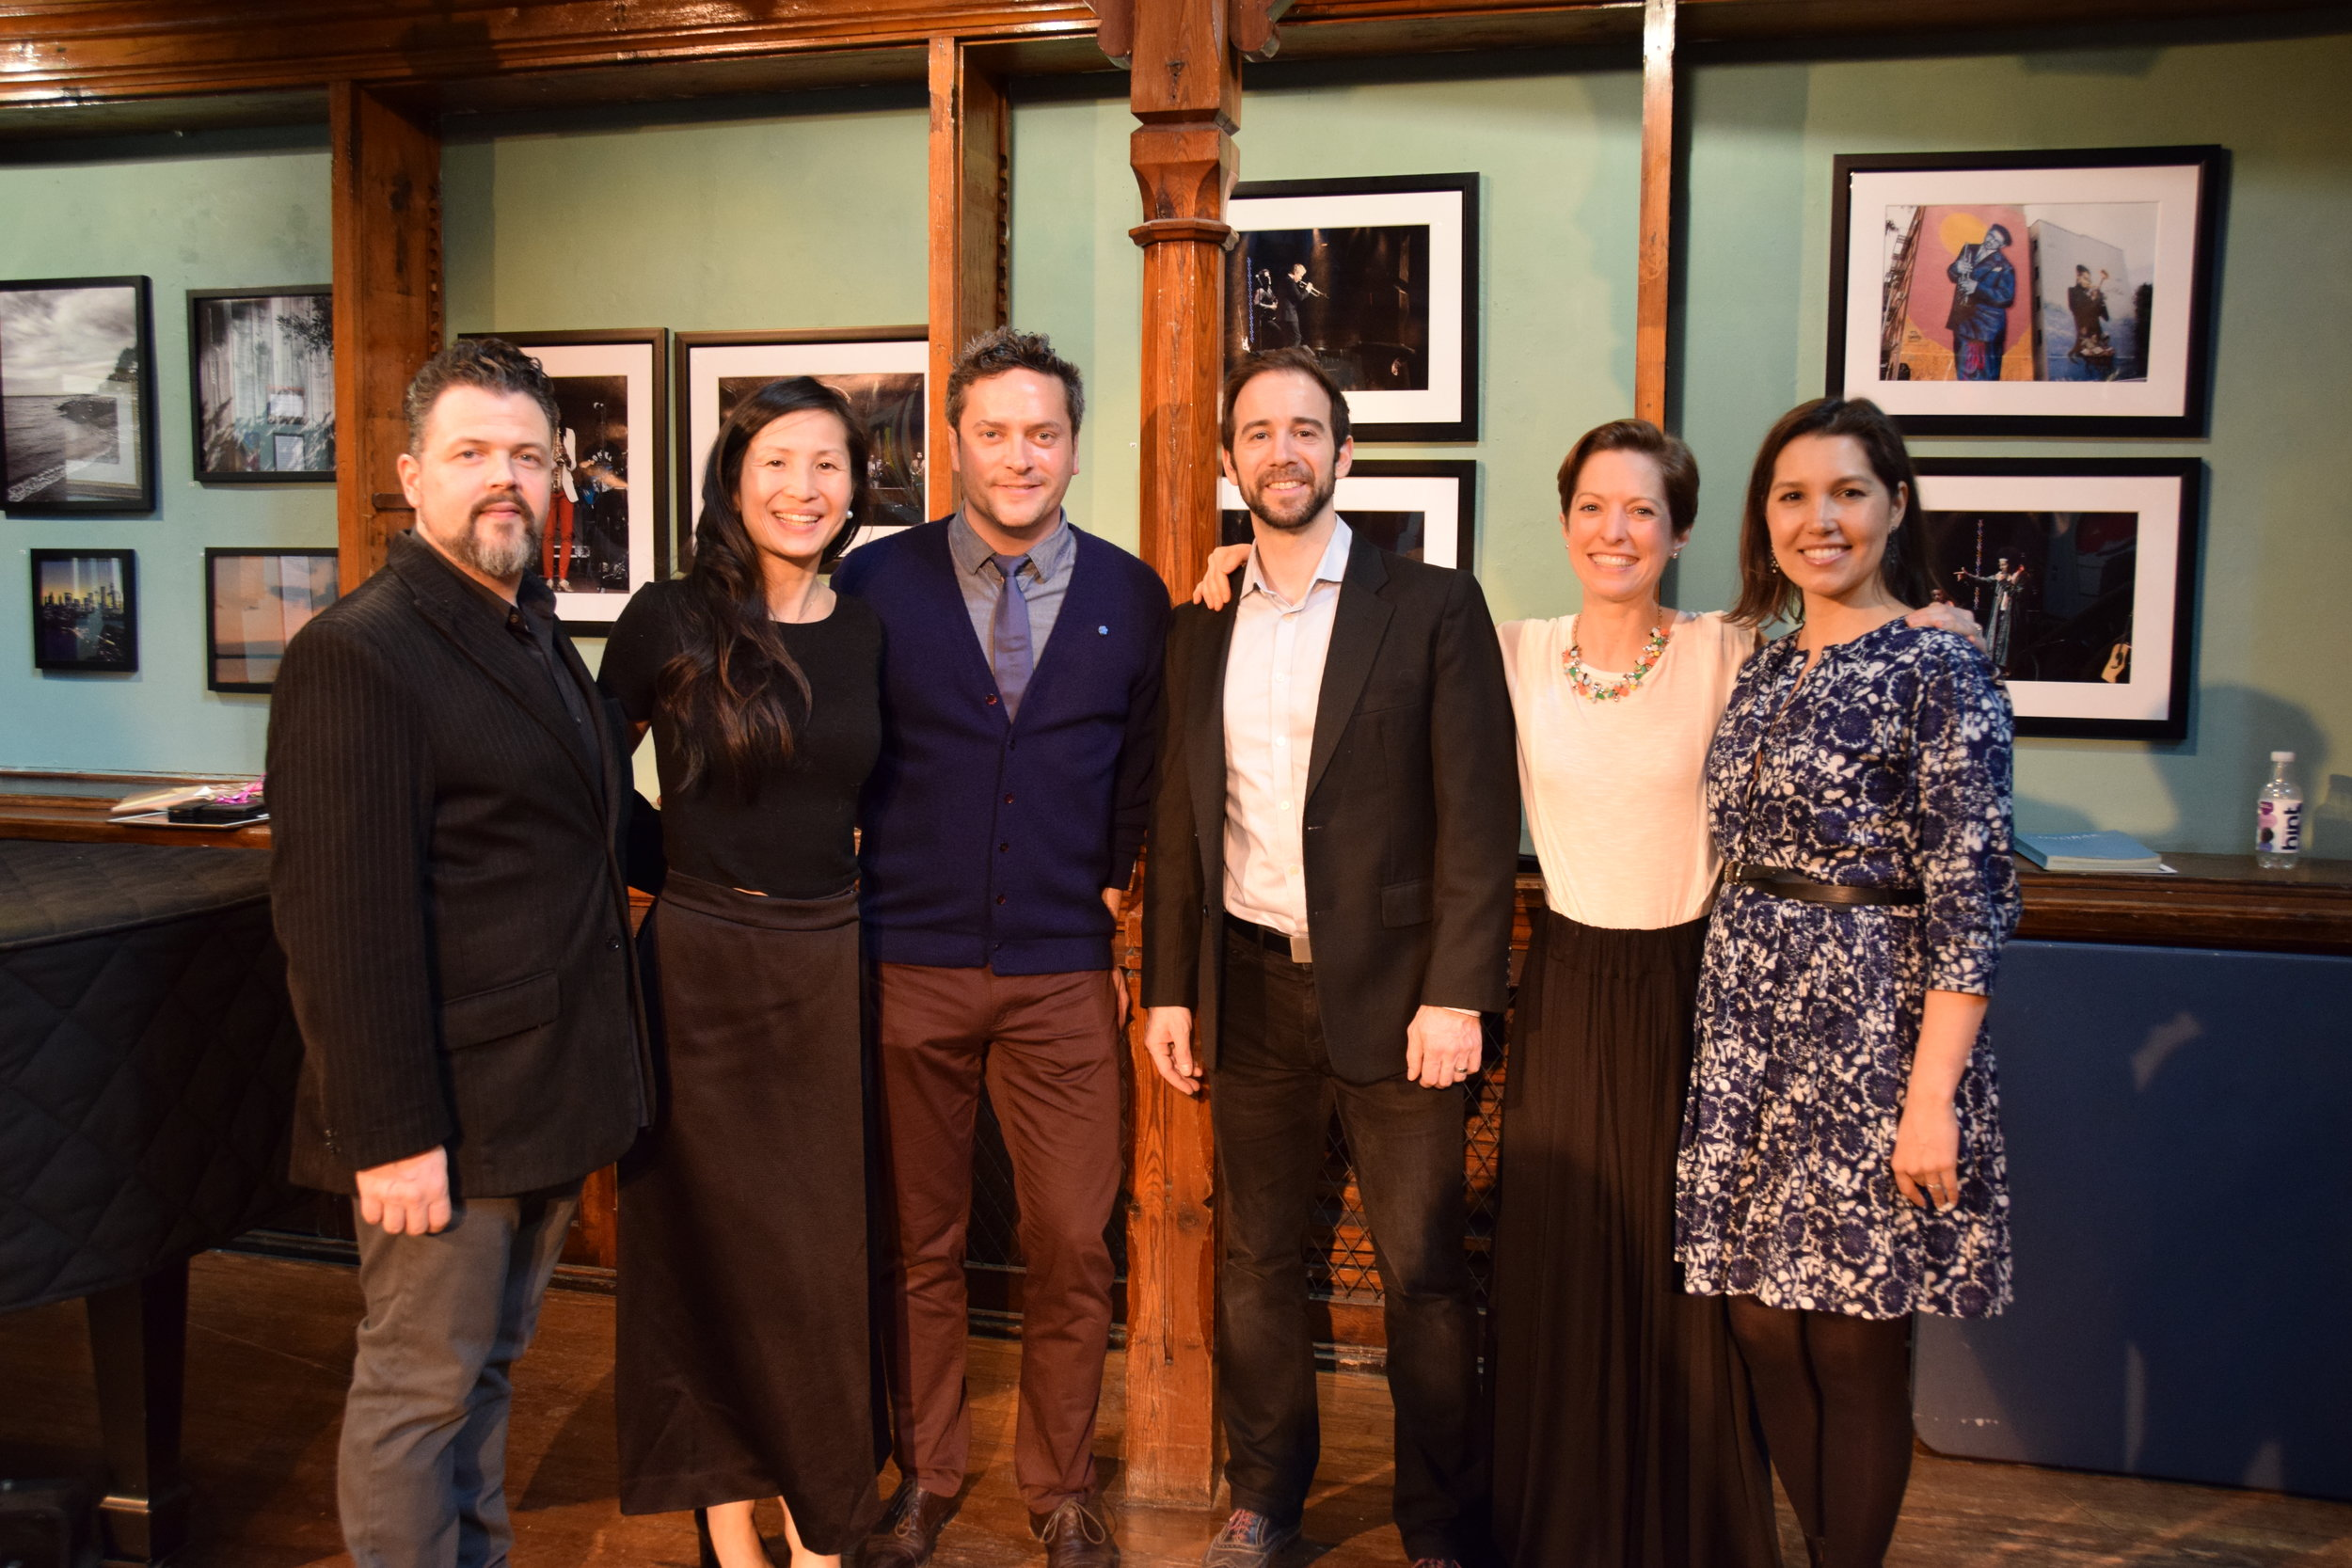 The gang's all here: from L to R, Greg Warren, Carol Wong (accompanist), Nathan Carlisle, Ross Benoliel, Lianne Coble-Dispensa, and Sara Heaton.